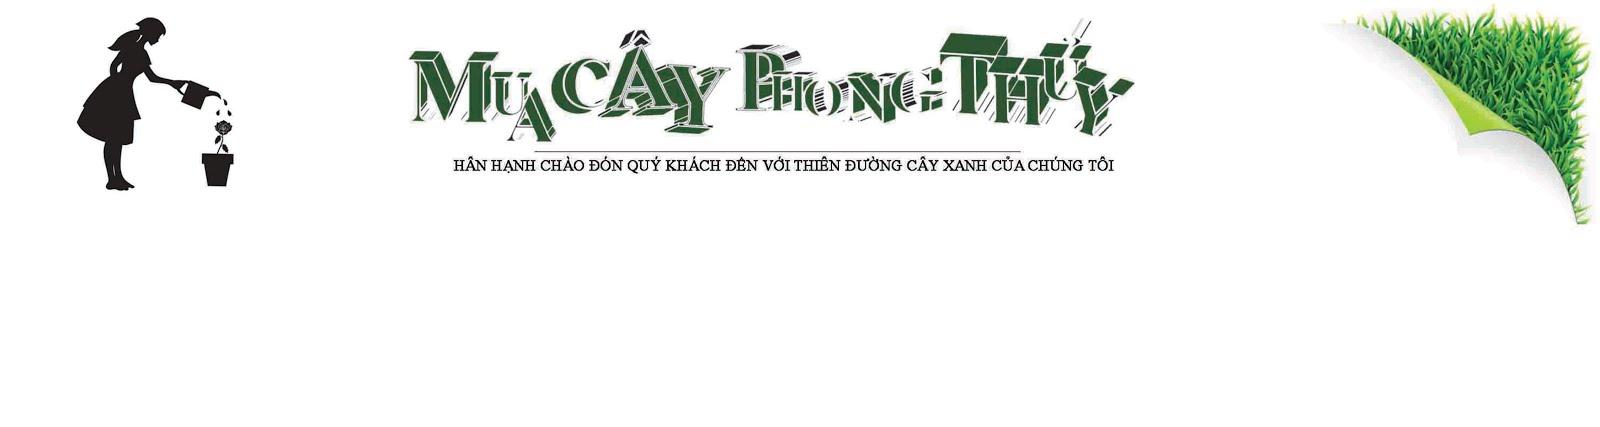 MUA CÂY PHONG THỦY